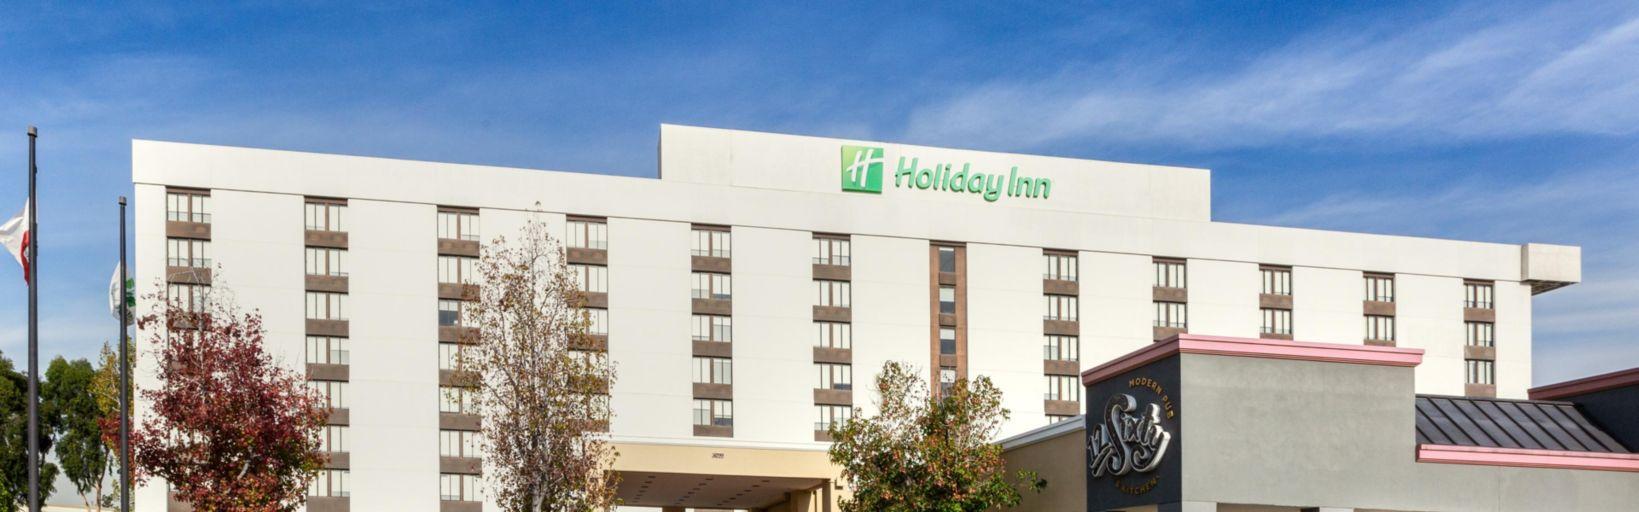 Holiday Inn La Mirada Hotel By Ihg